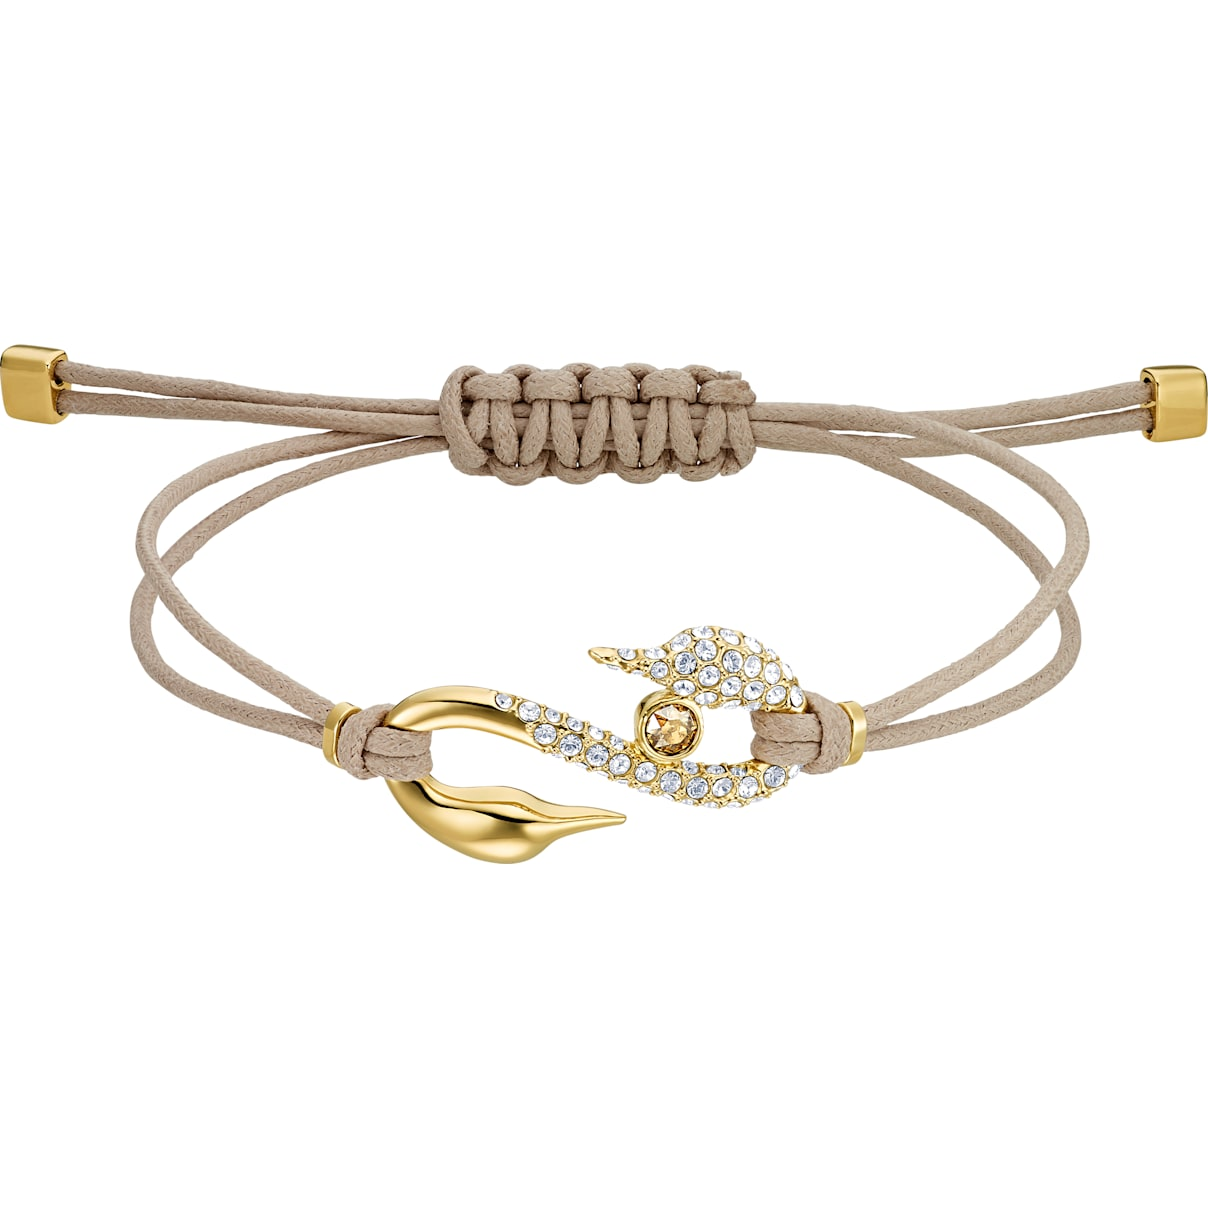 Swarovski Swarovski Power Collection Hook Bracelet, Brown, Gold-tone plated